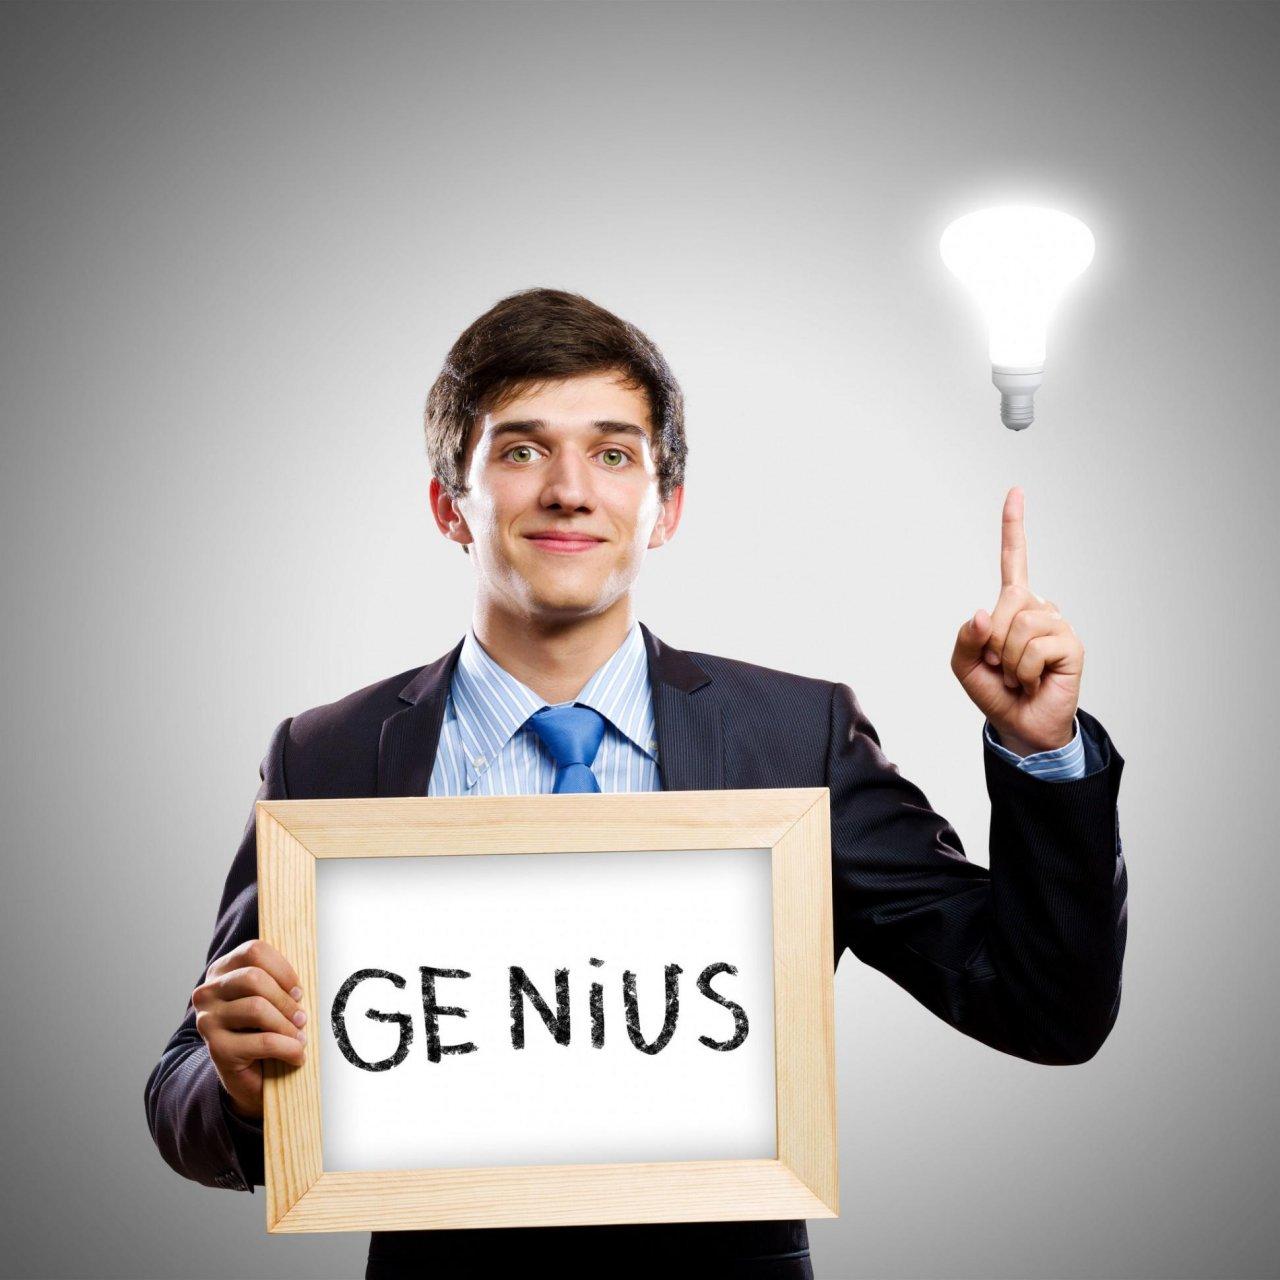 Marketing-Genius-1940x1940.jpg